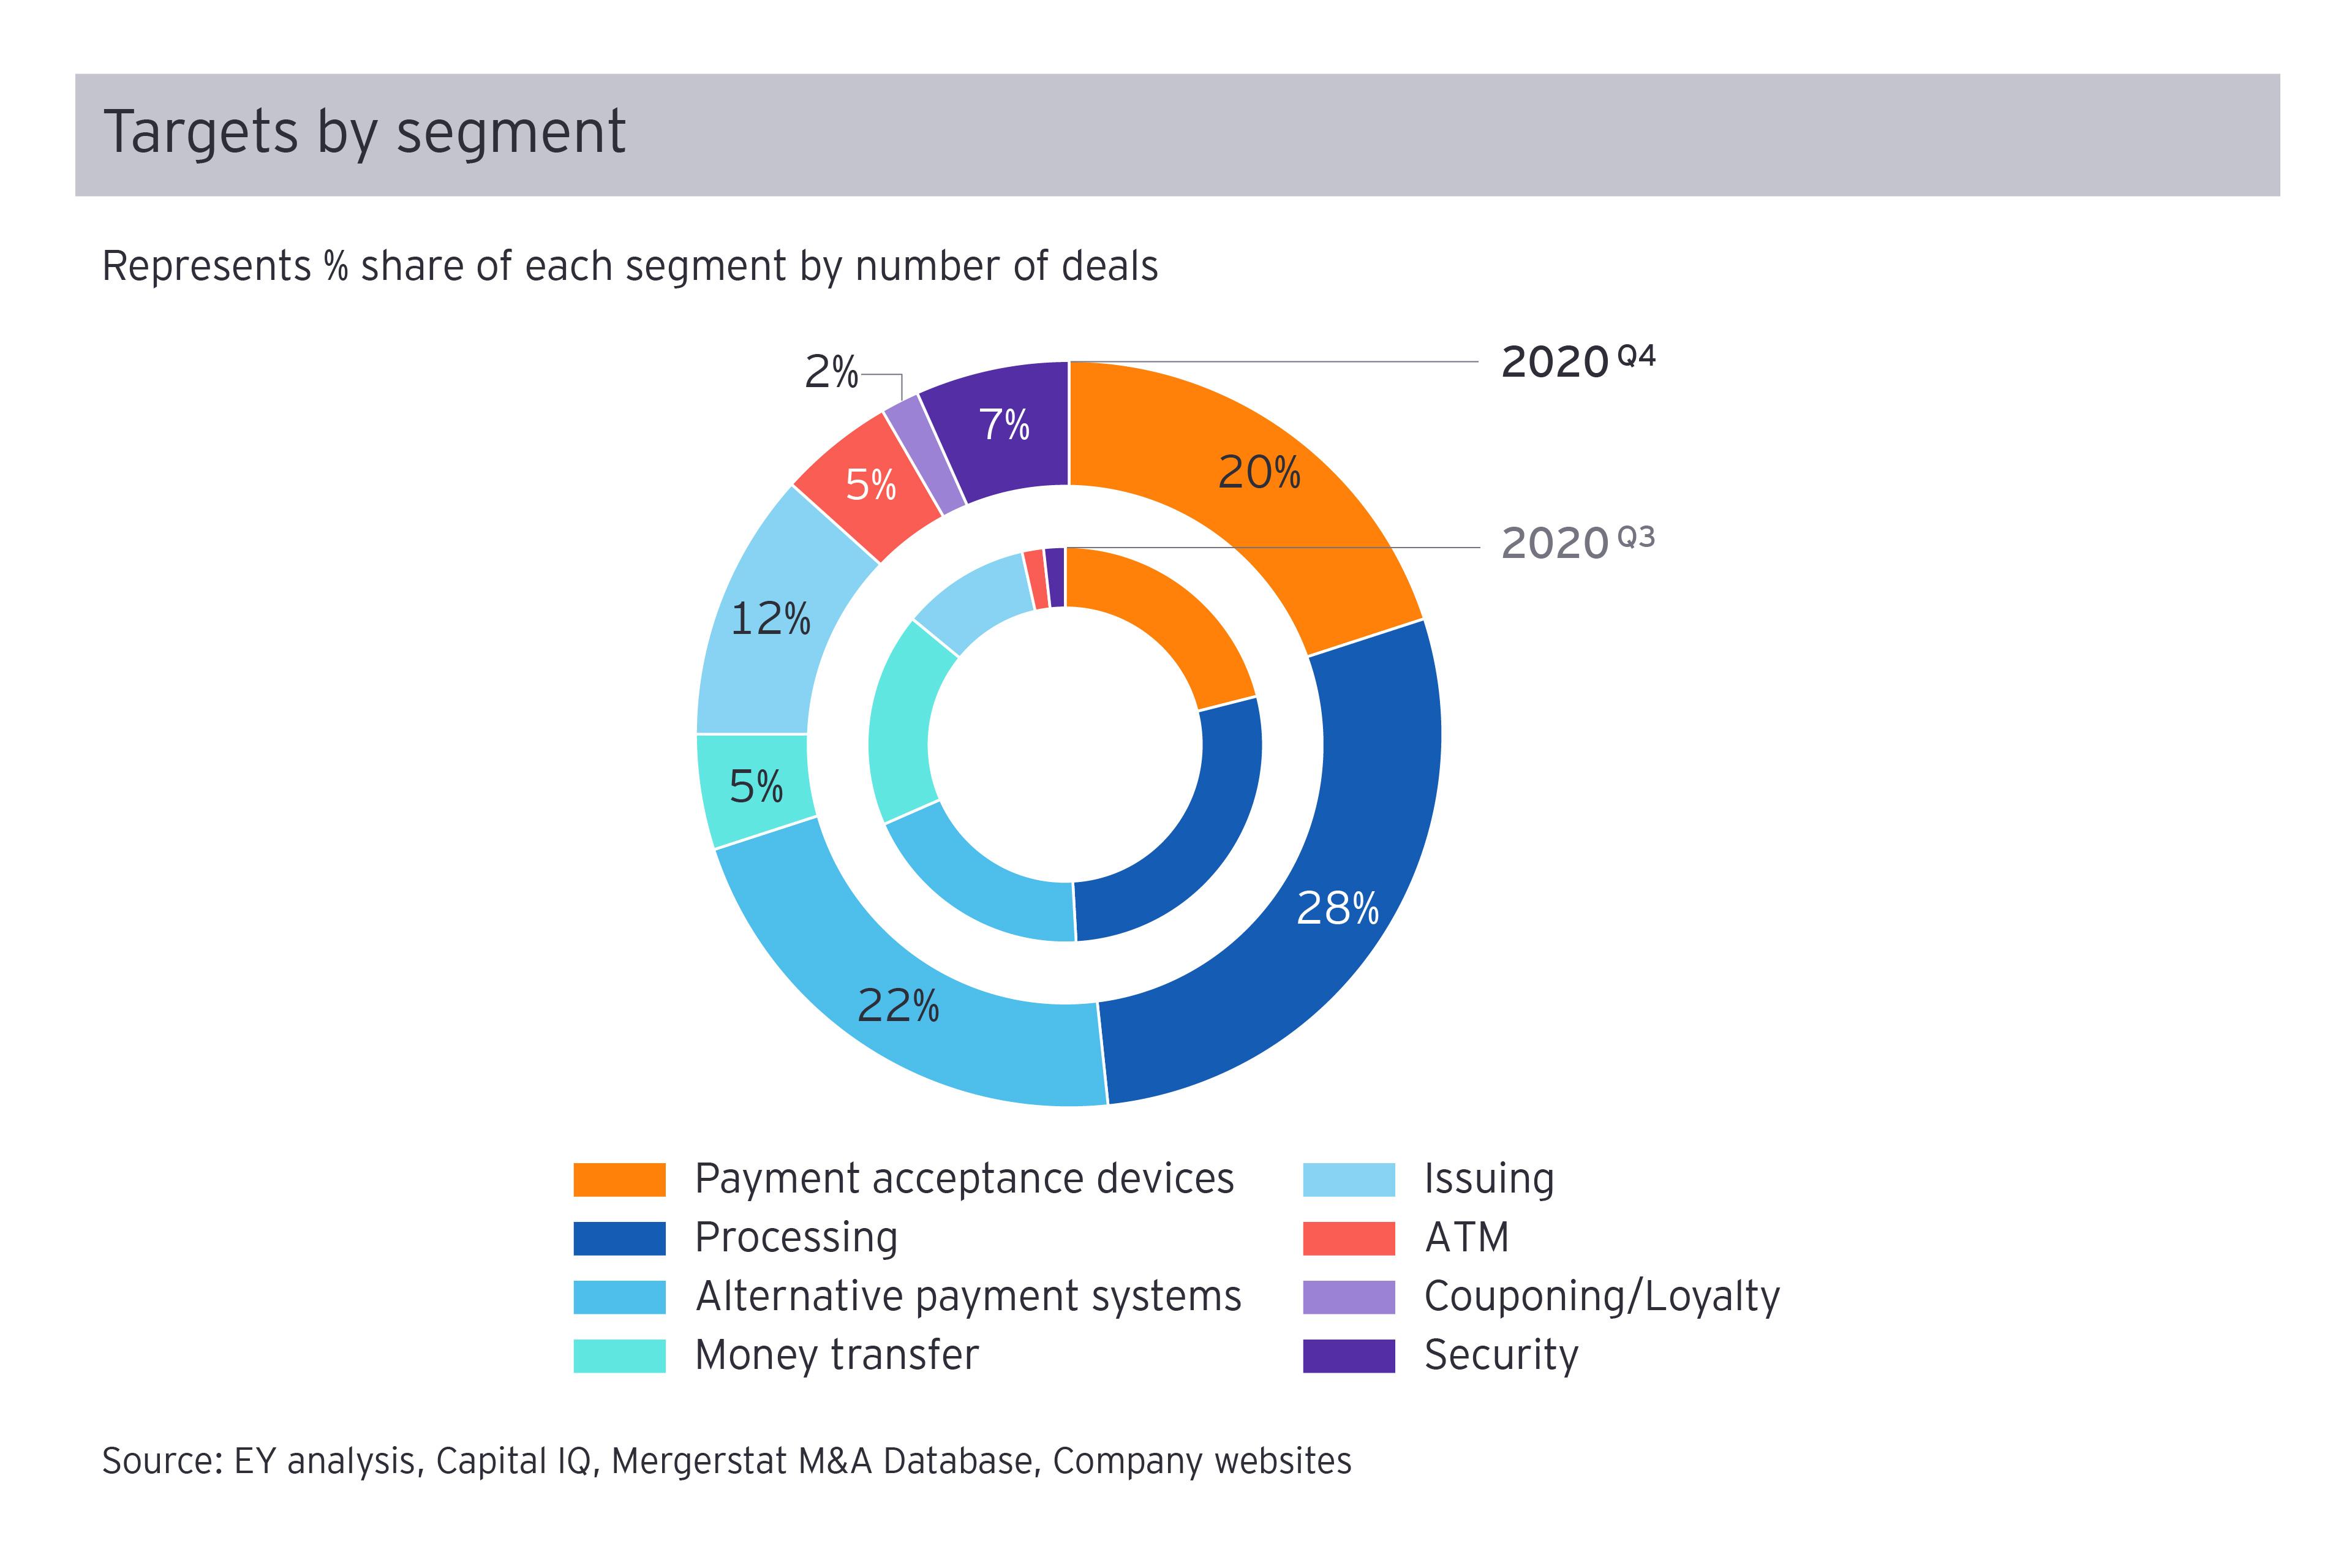 Targets by segment Q4 2020